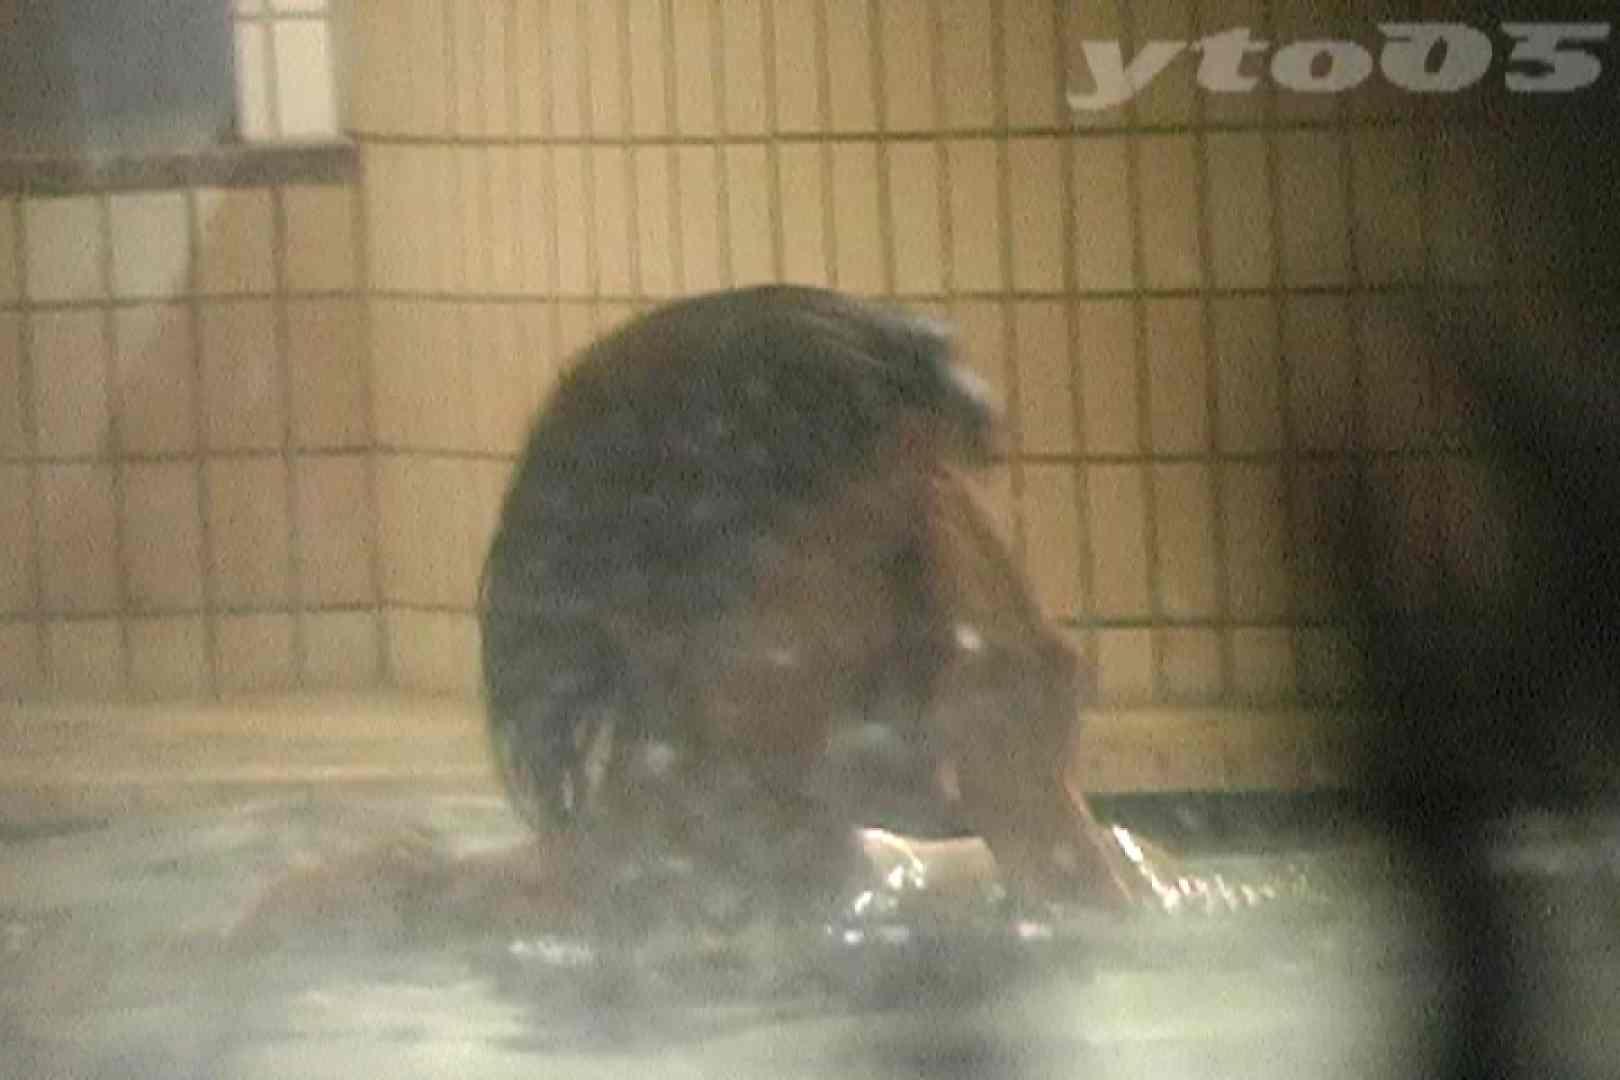 ▲復活限定▲合宿ホテル女風呂盗撮 Vol.28 OL | 合宿  38連発 14